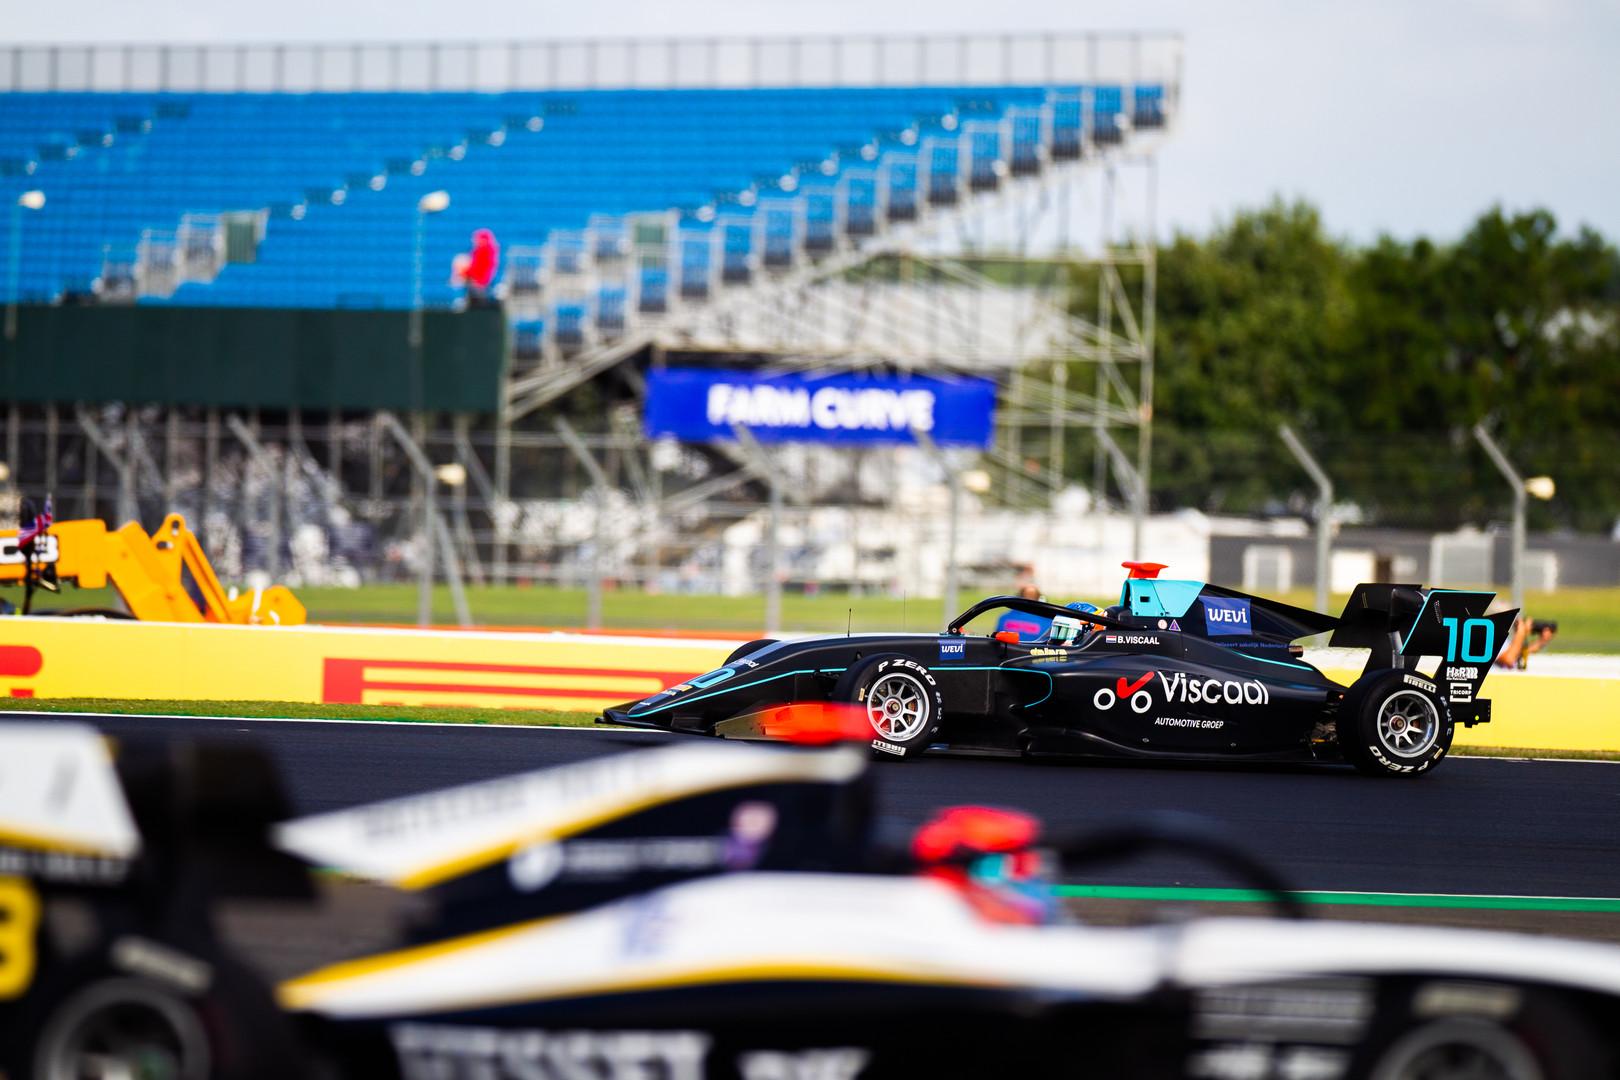 Bent F3 Silverstone 14-07-2019.jpg